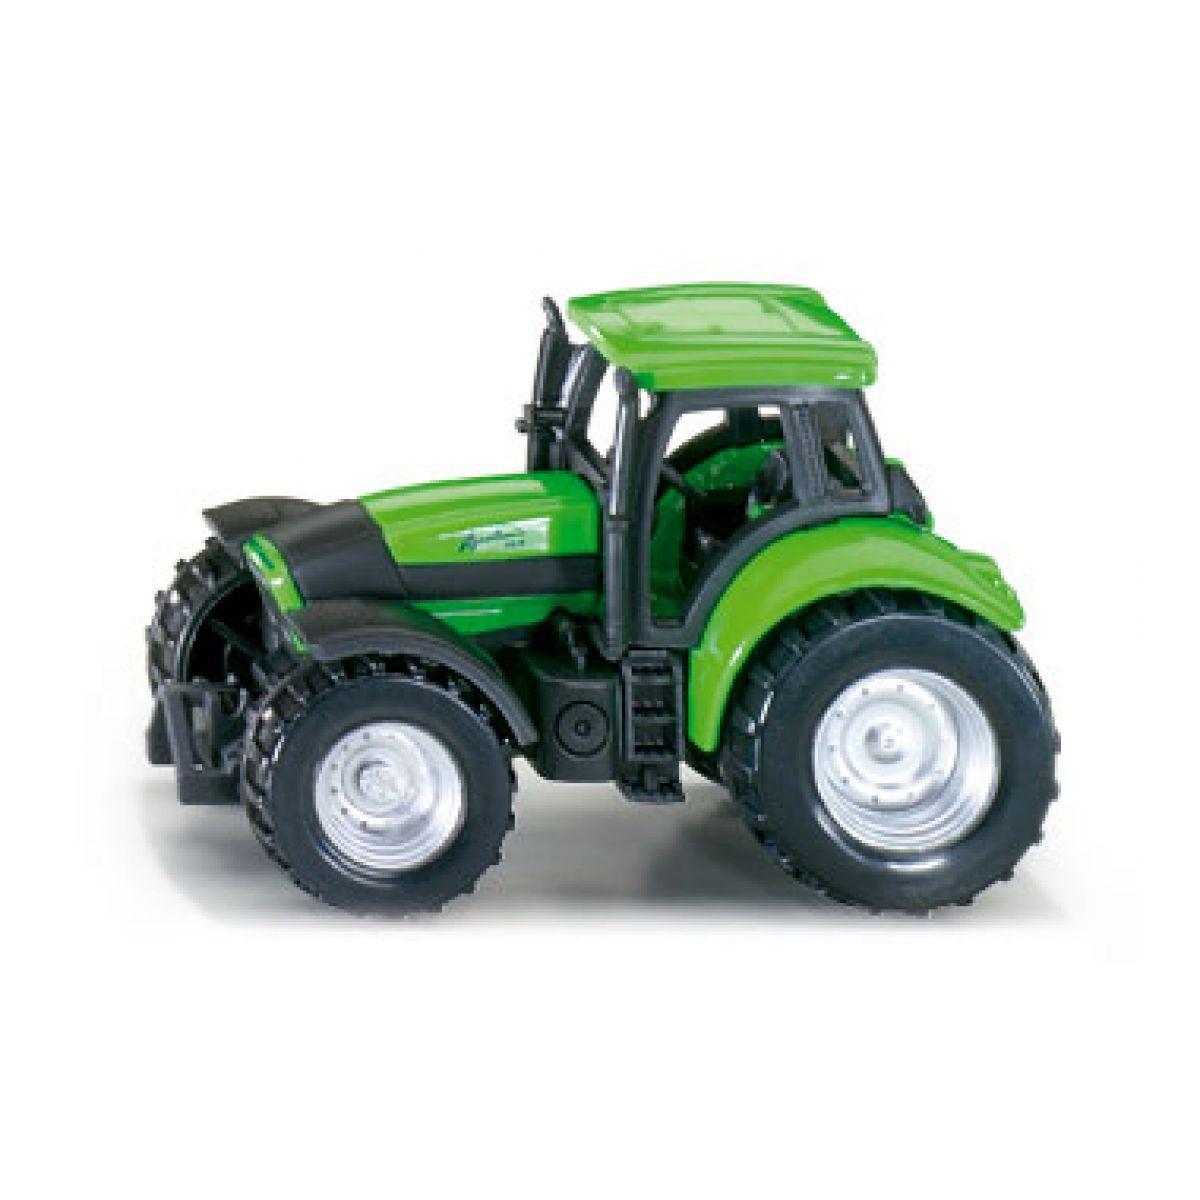 Siku 0859 Traktor Deutz Agrotron